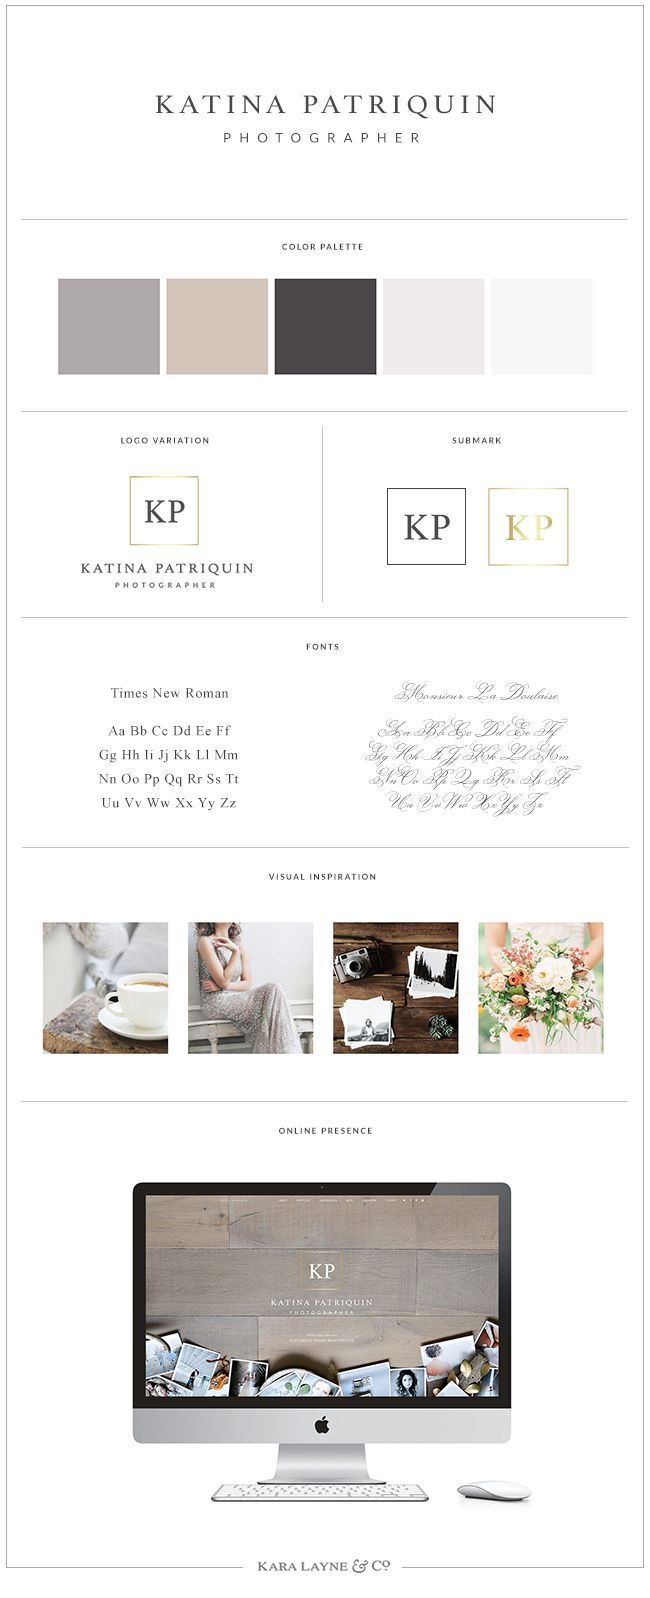 Logo Design and Brand Styling for Katina Patriquin, Arizona photographer | KaraLayneAndCo.com